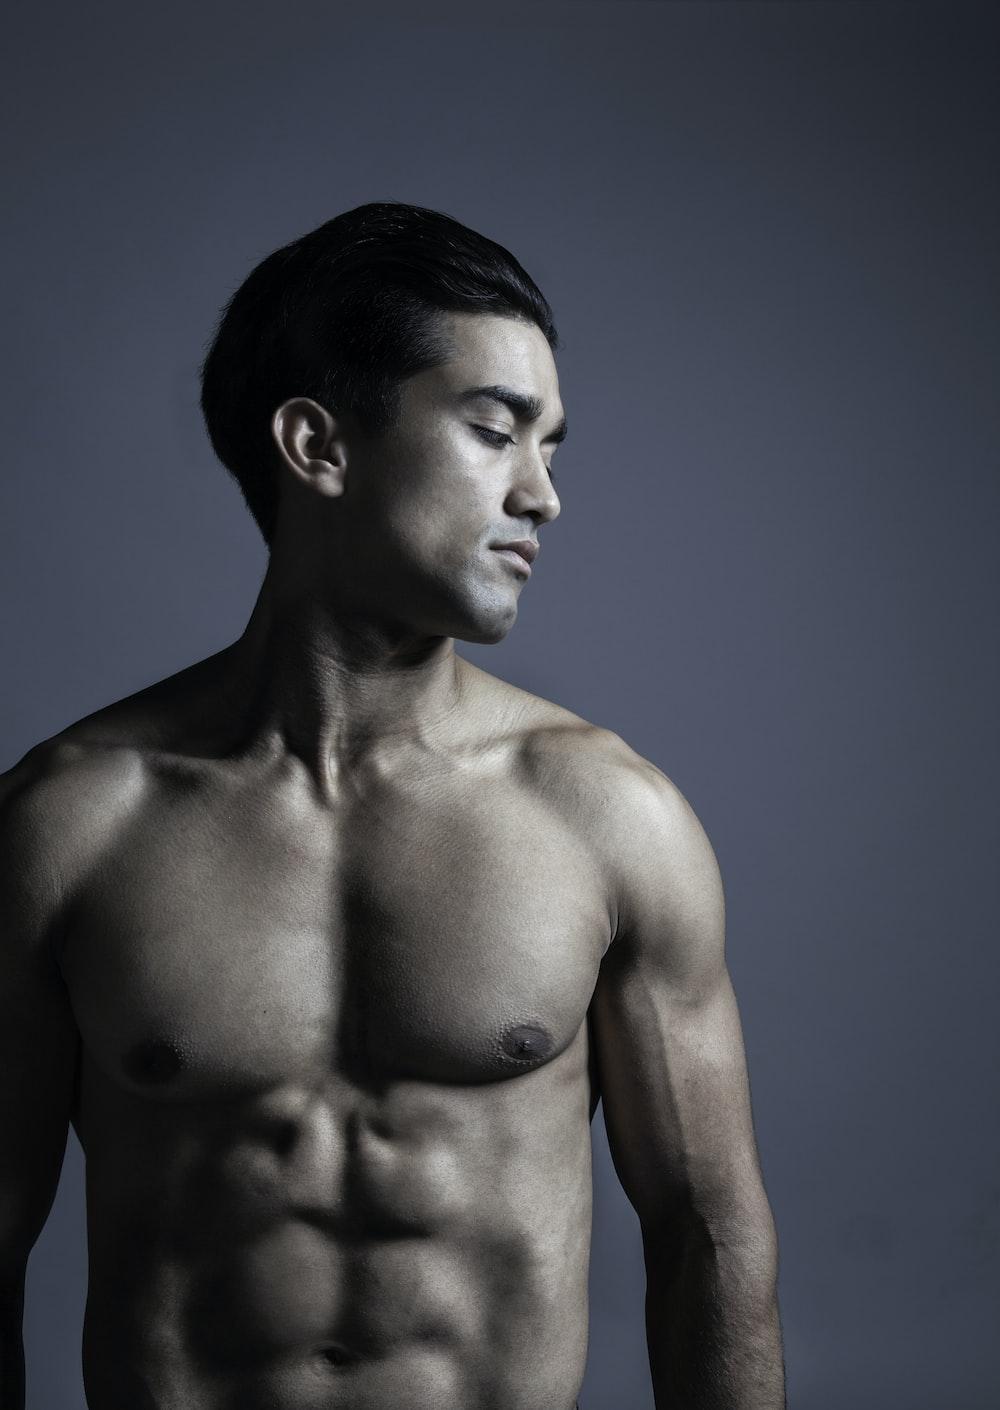 topless man in blue denim bottoms